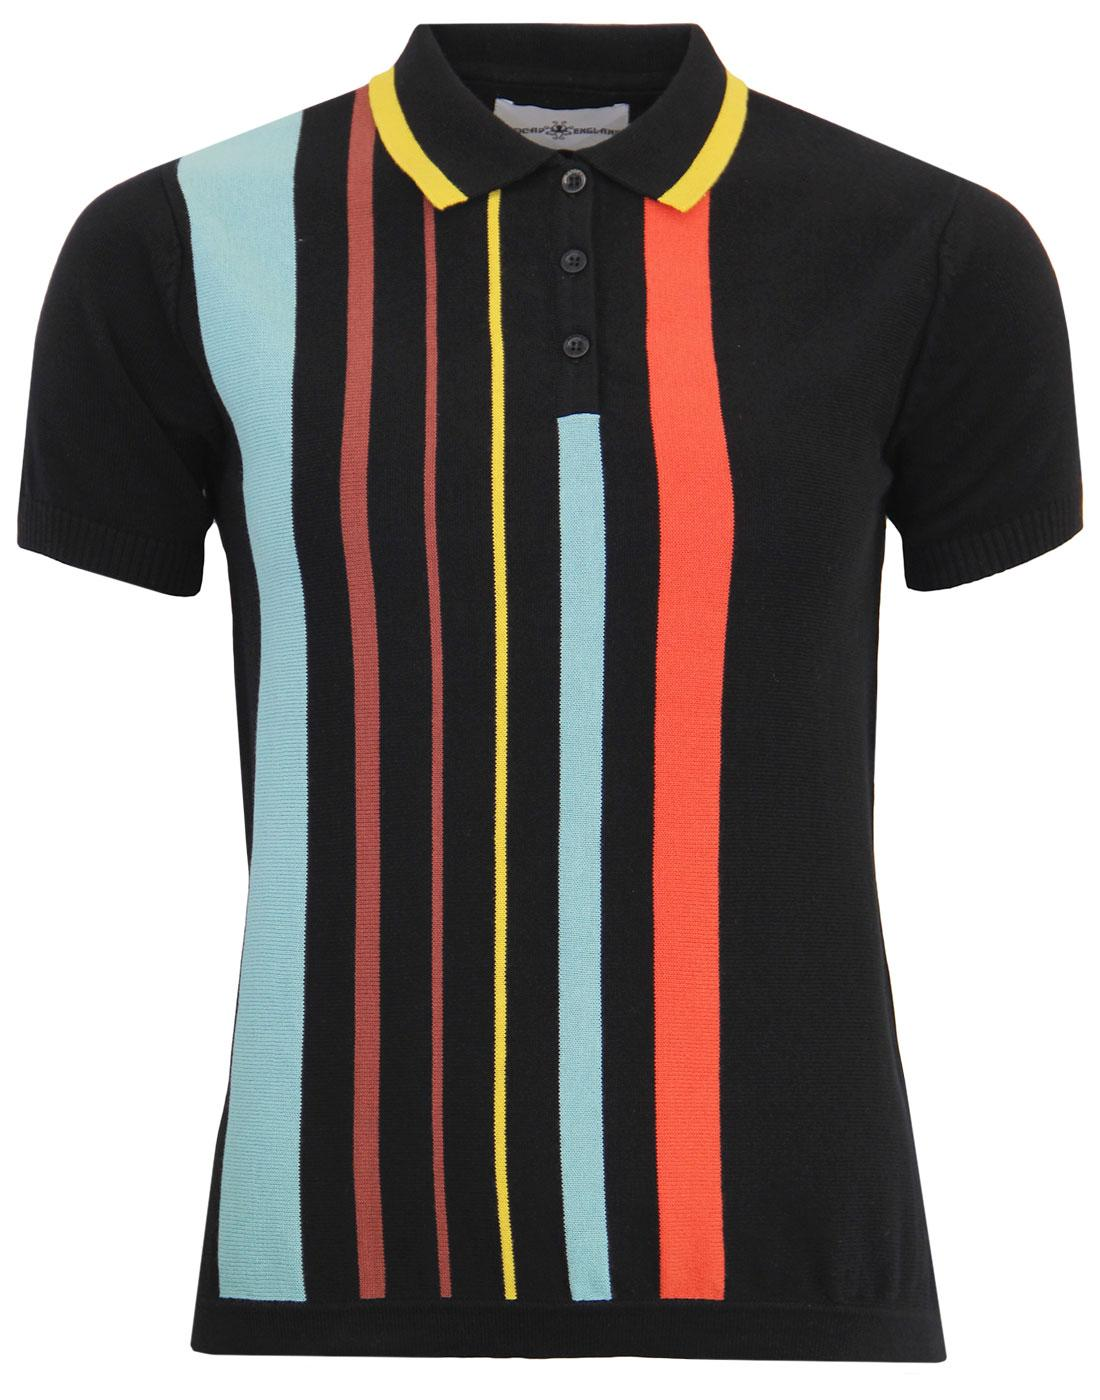 madcap england bauhaus belle mod stripe polo black